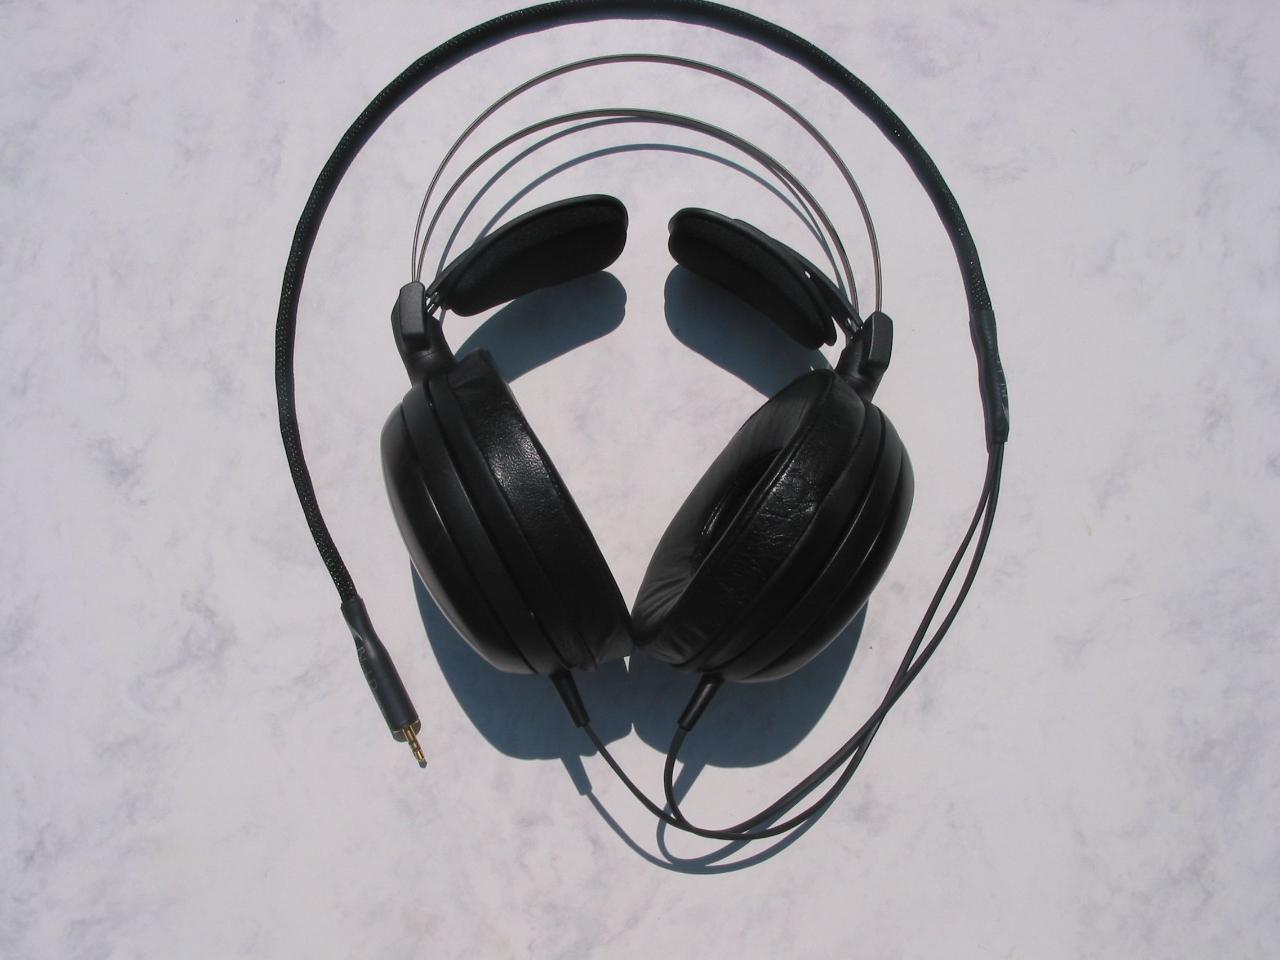 Audio Technica with Moon Audio Black Dragon V1 Headphone Cable - the 'original black dragon...